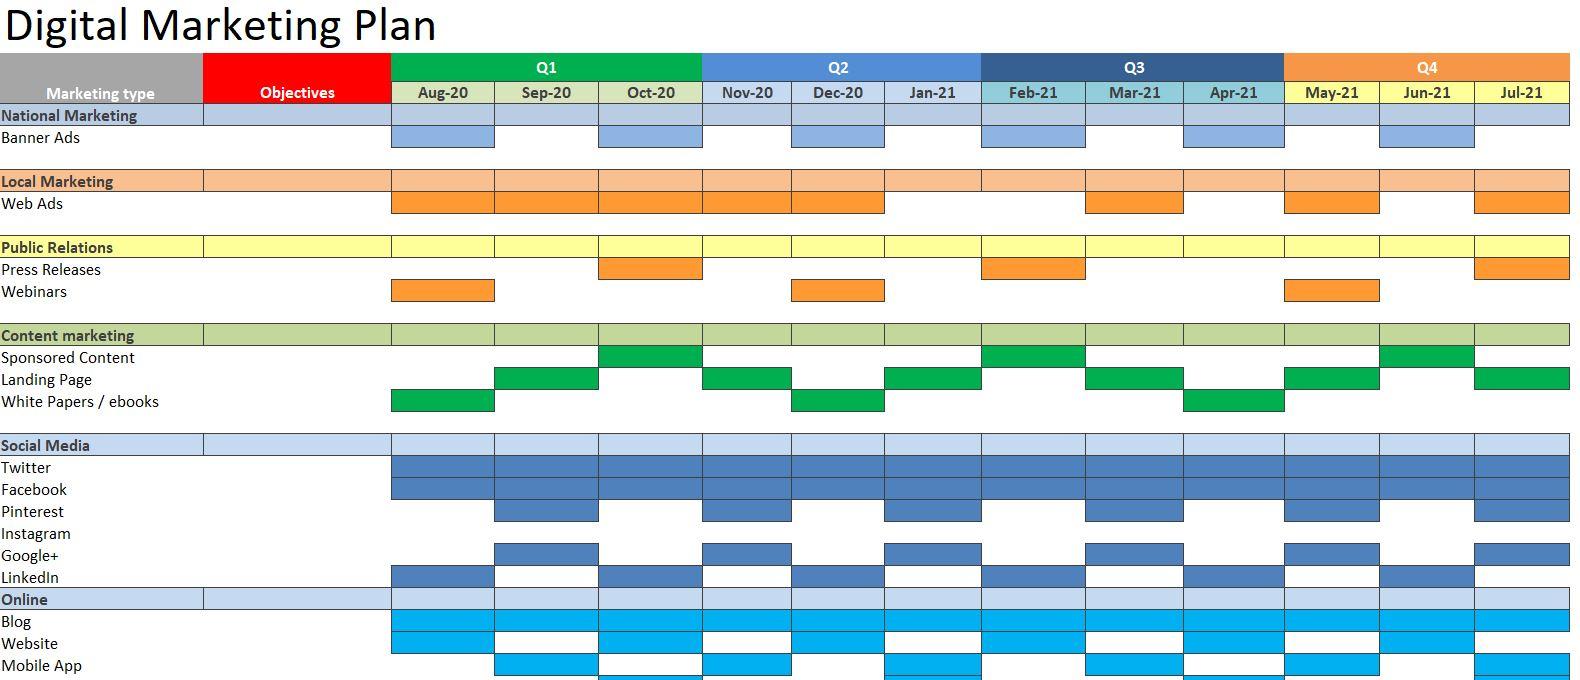 digital-marketing-plan-template